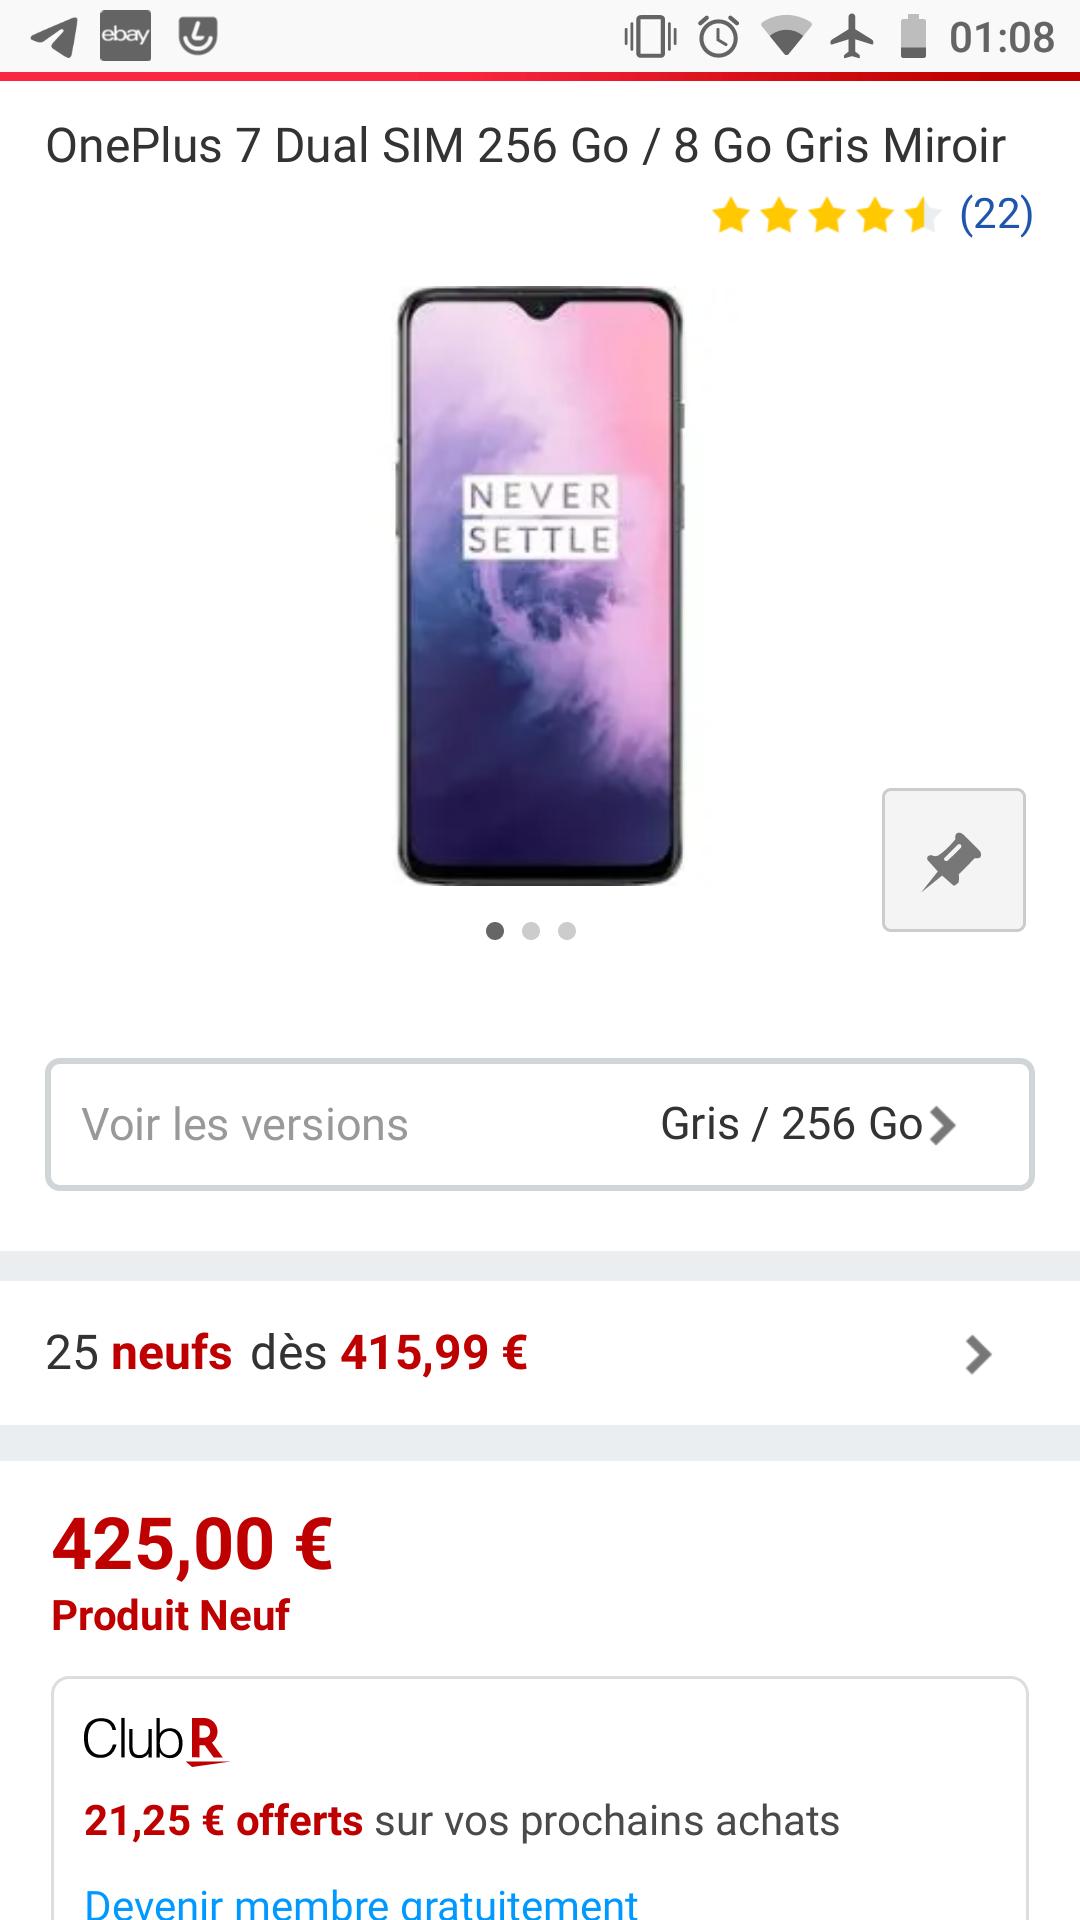 OnePlus 7 Dual SIM 256 Go / 8 Go Gris Miroir VERSAND AUS UK (7-10 Tage) RakutenFr/Importshop